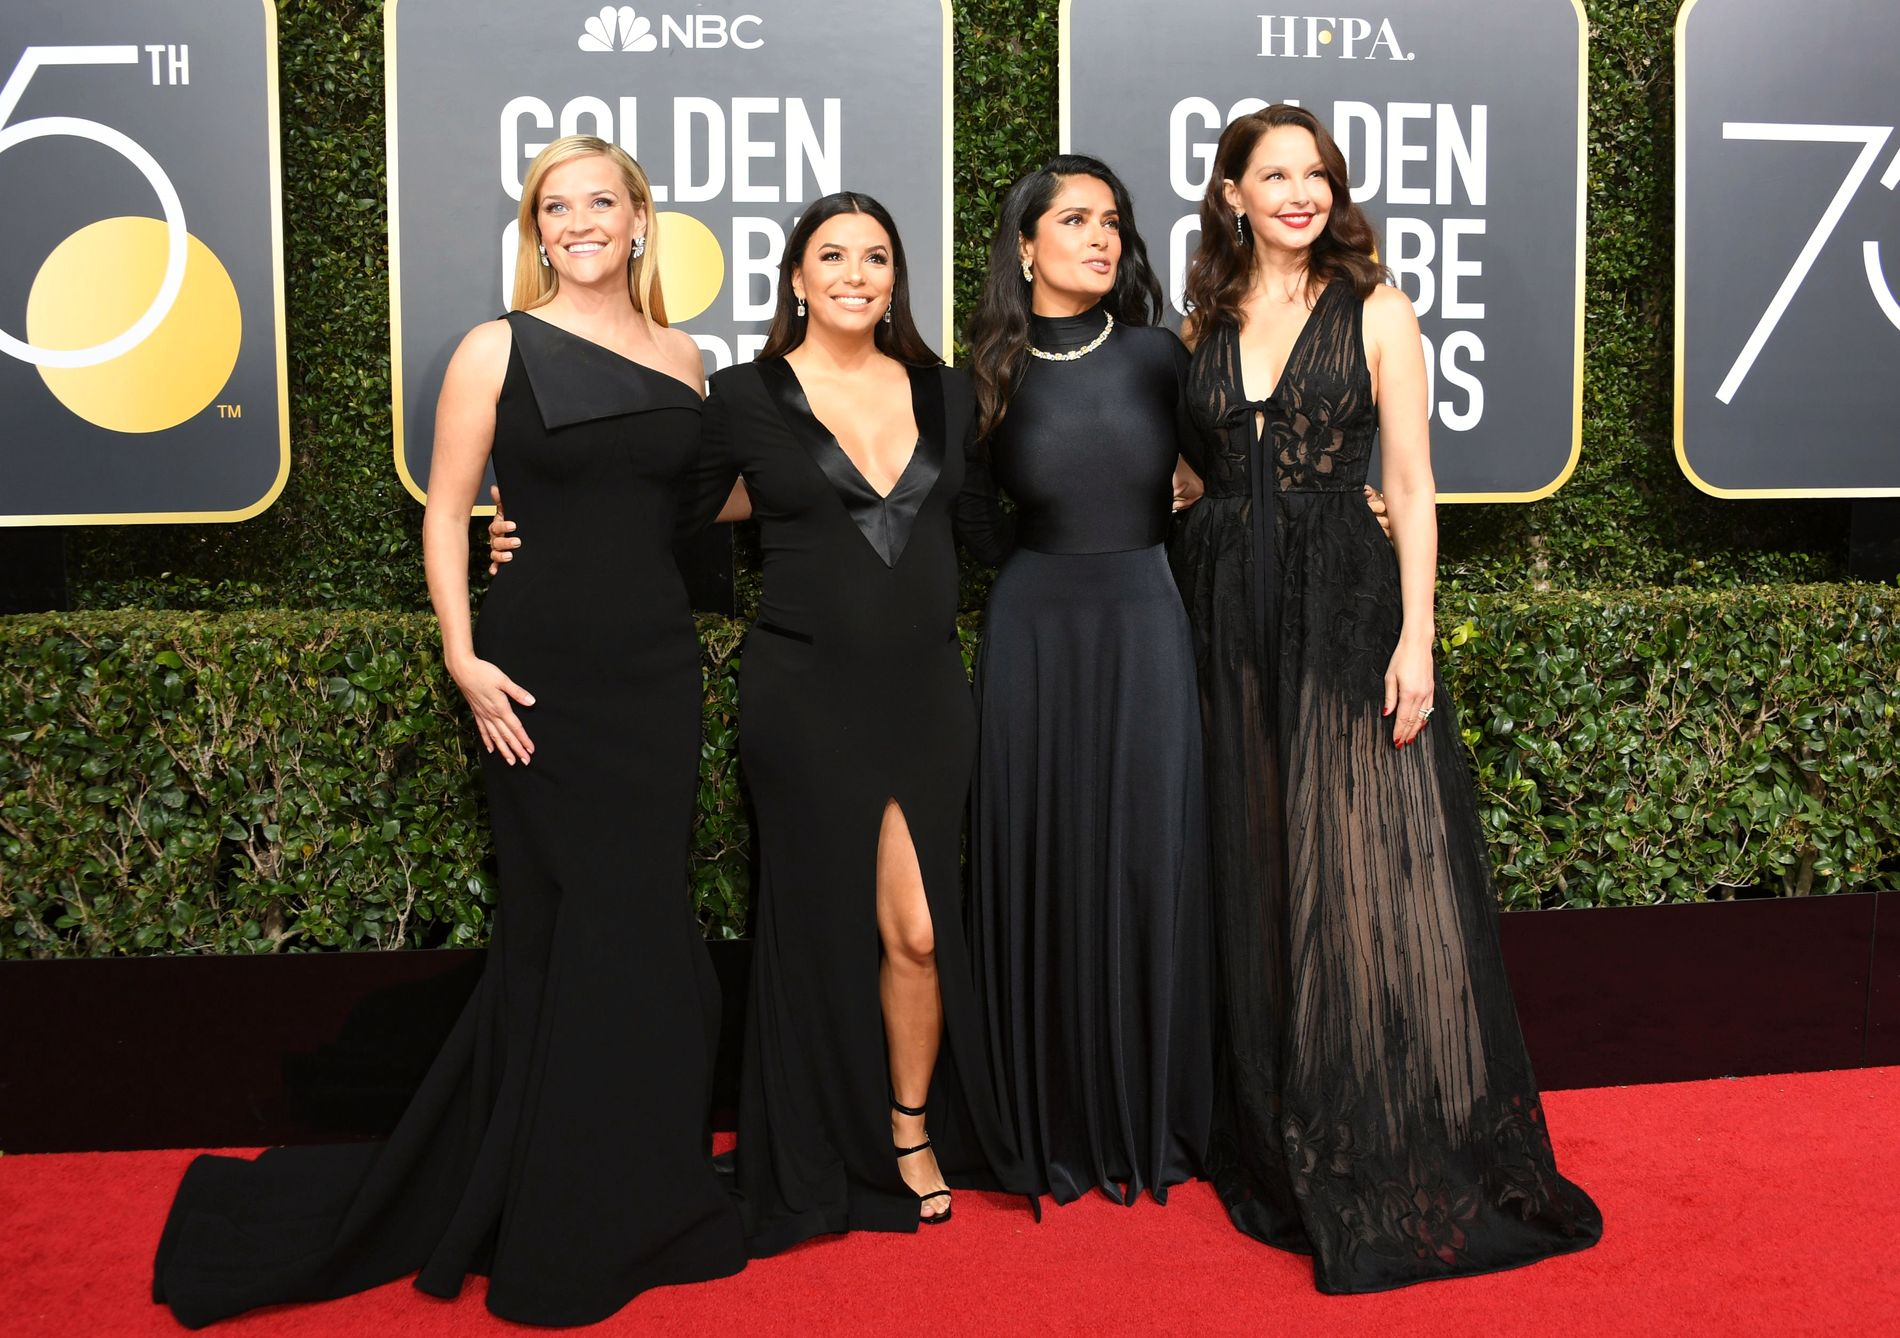 KLEDD I SVART: Skuespillerne Reese Witherspoon, Eva Longoria, Salma Hayek og Ashley Judd.